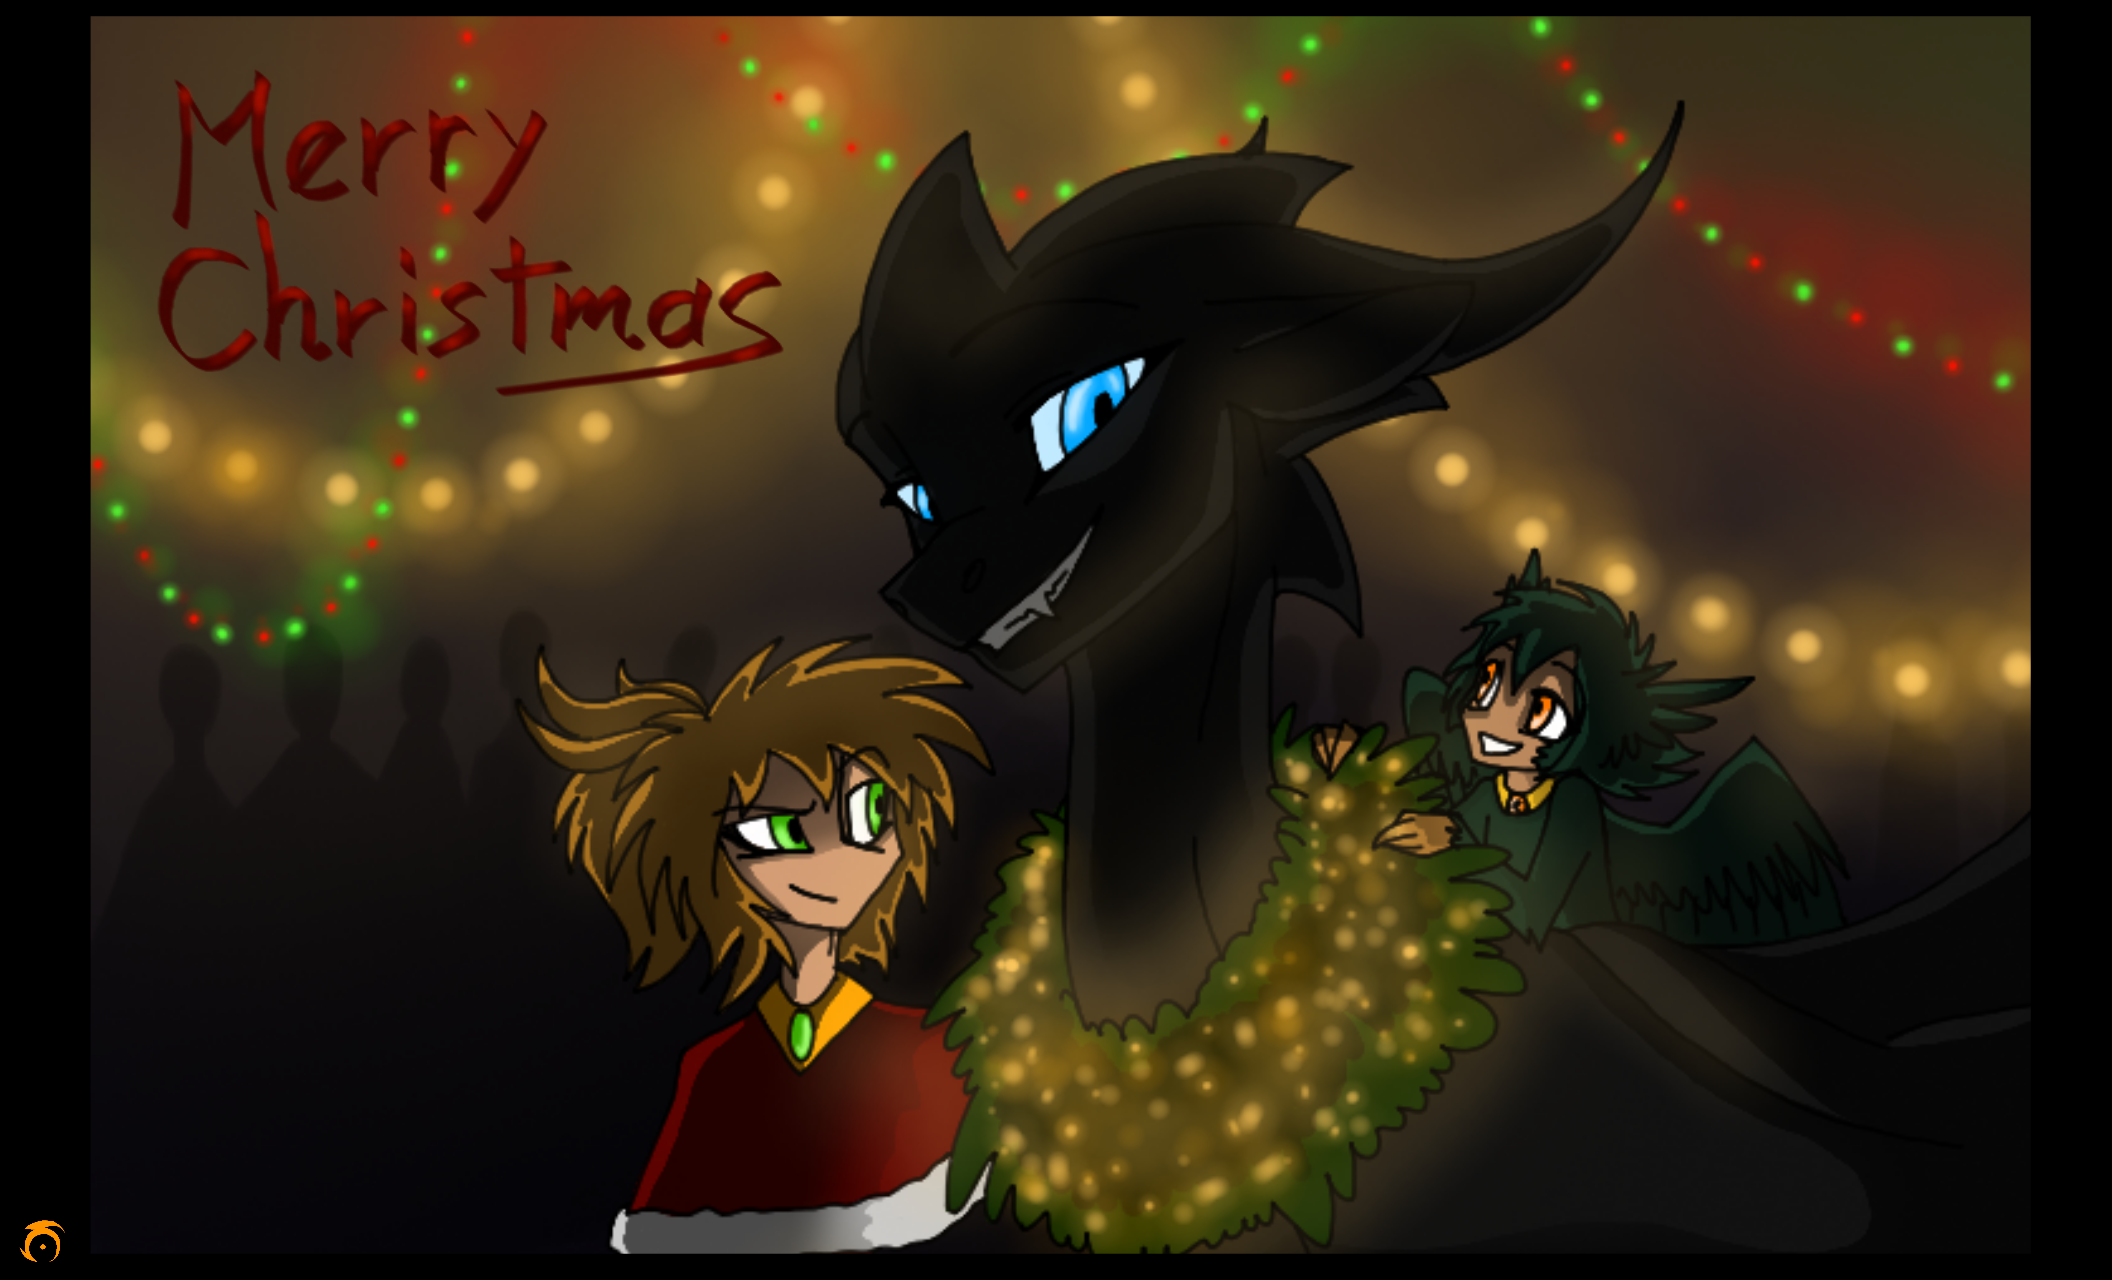 Looping Lights. Merry Christmas by CoffeeAddictedDragon